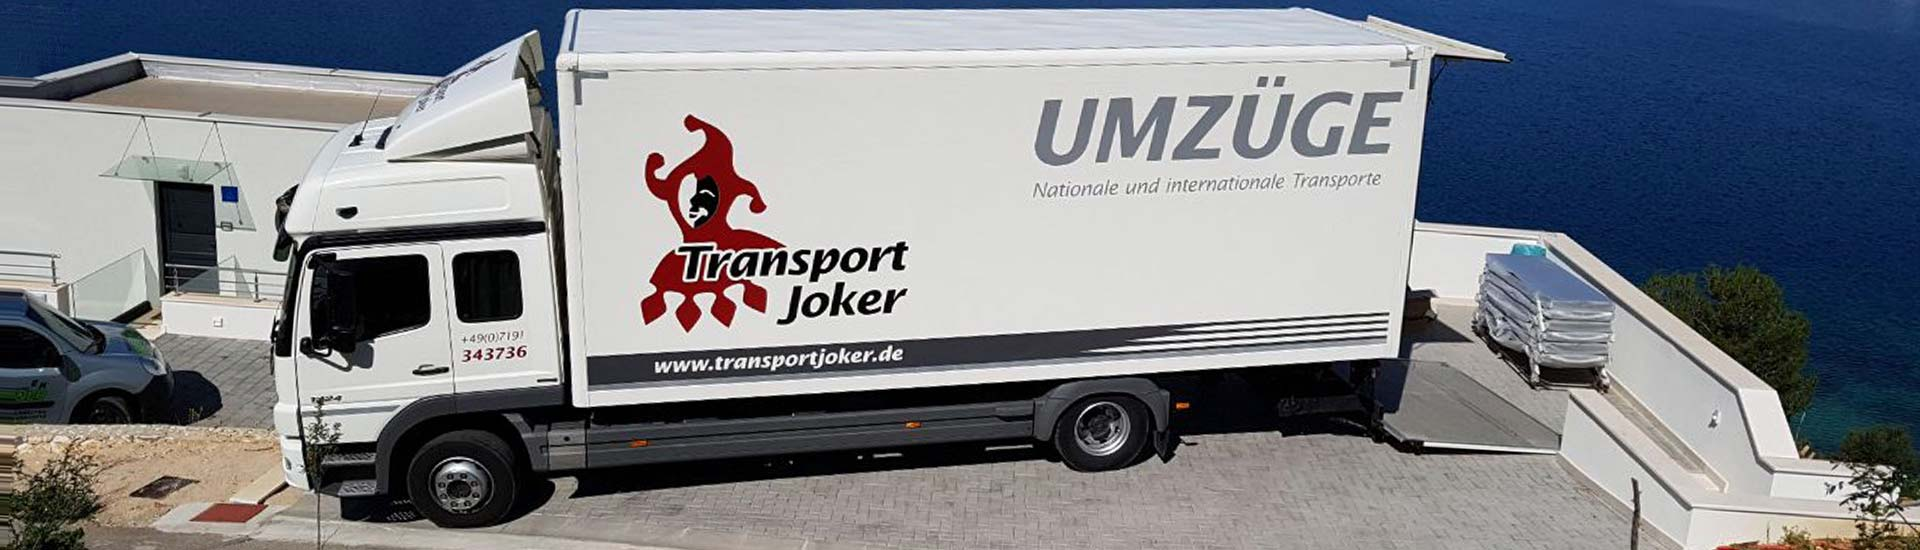 Transport Joker GmbH Slider neu